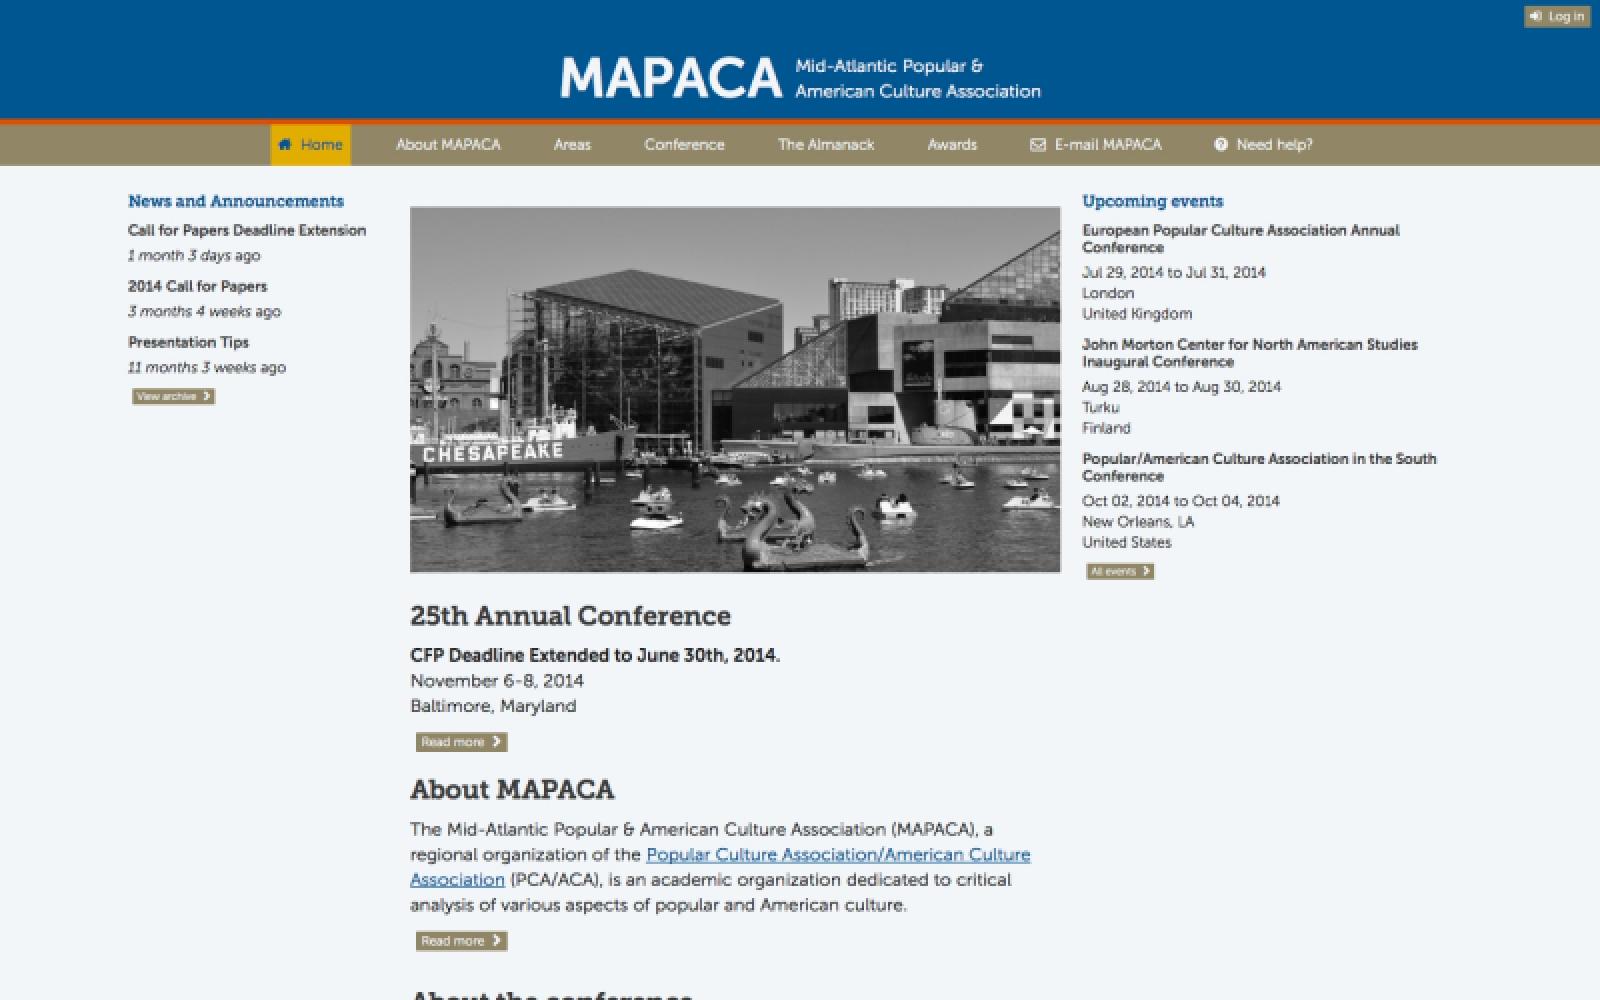 mapaca.net 2014 front page